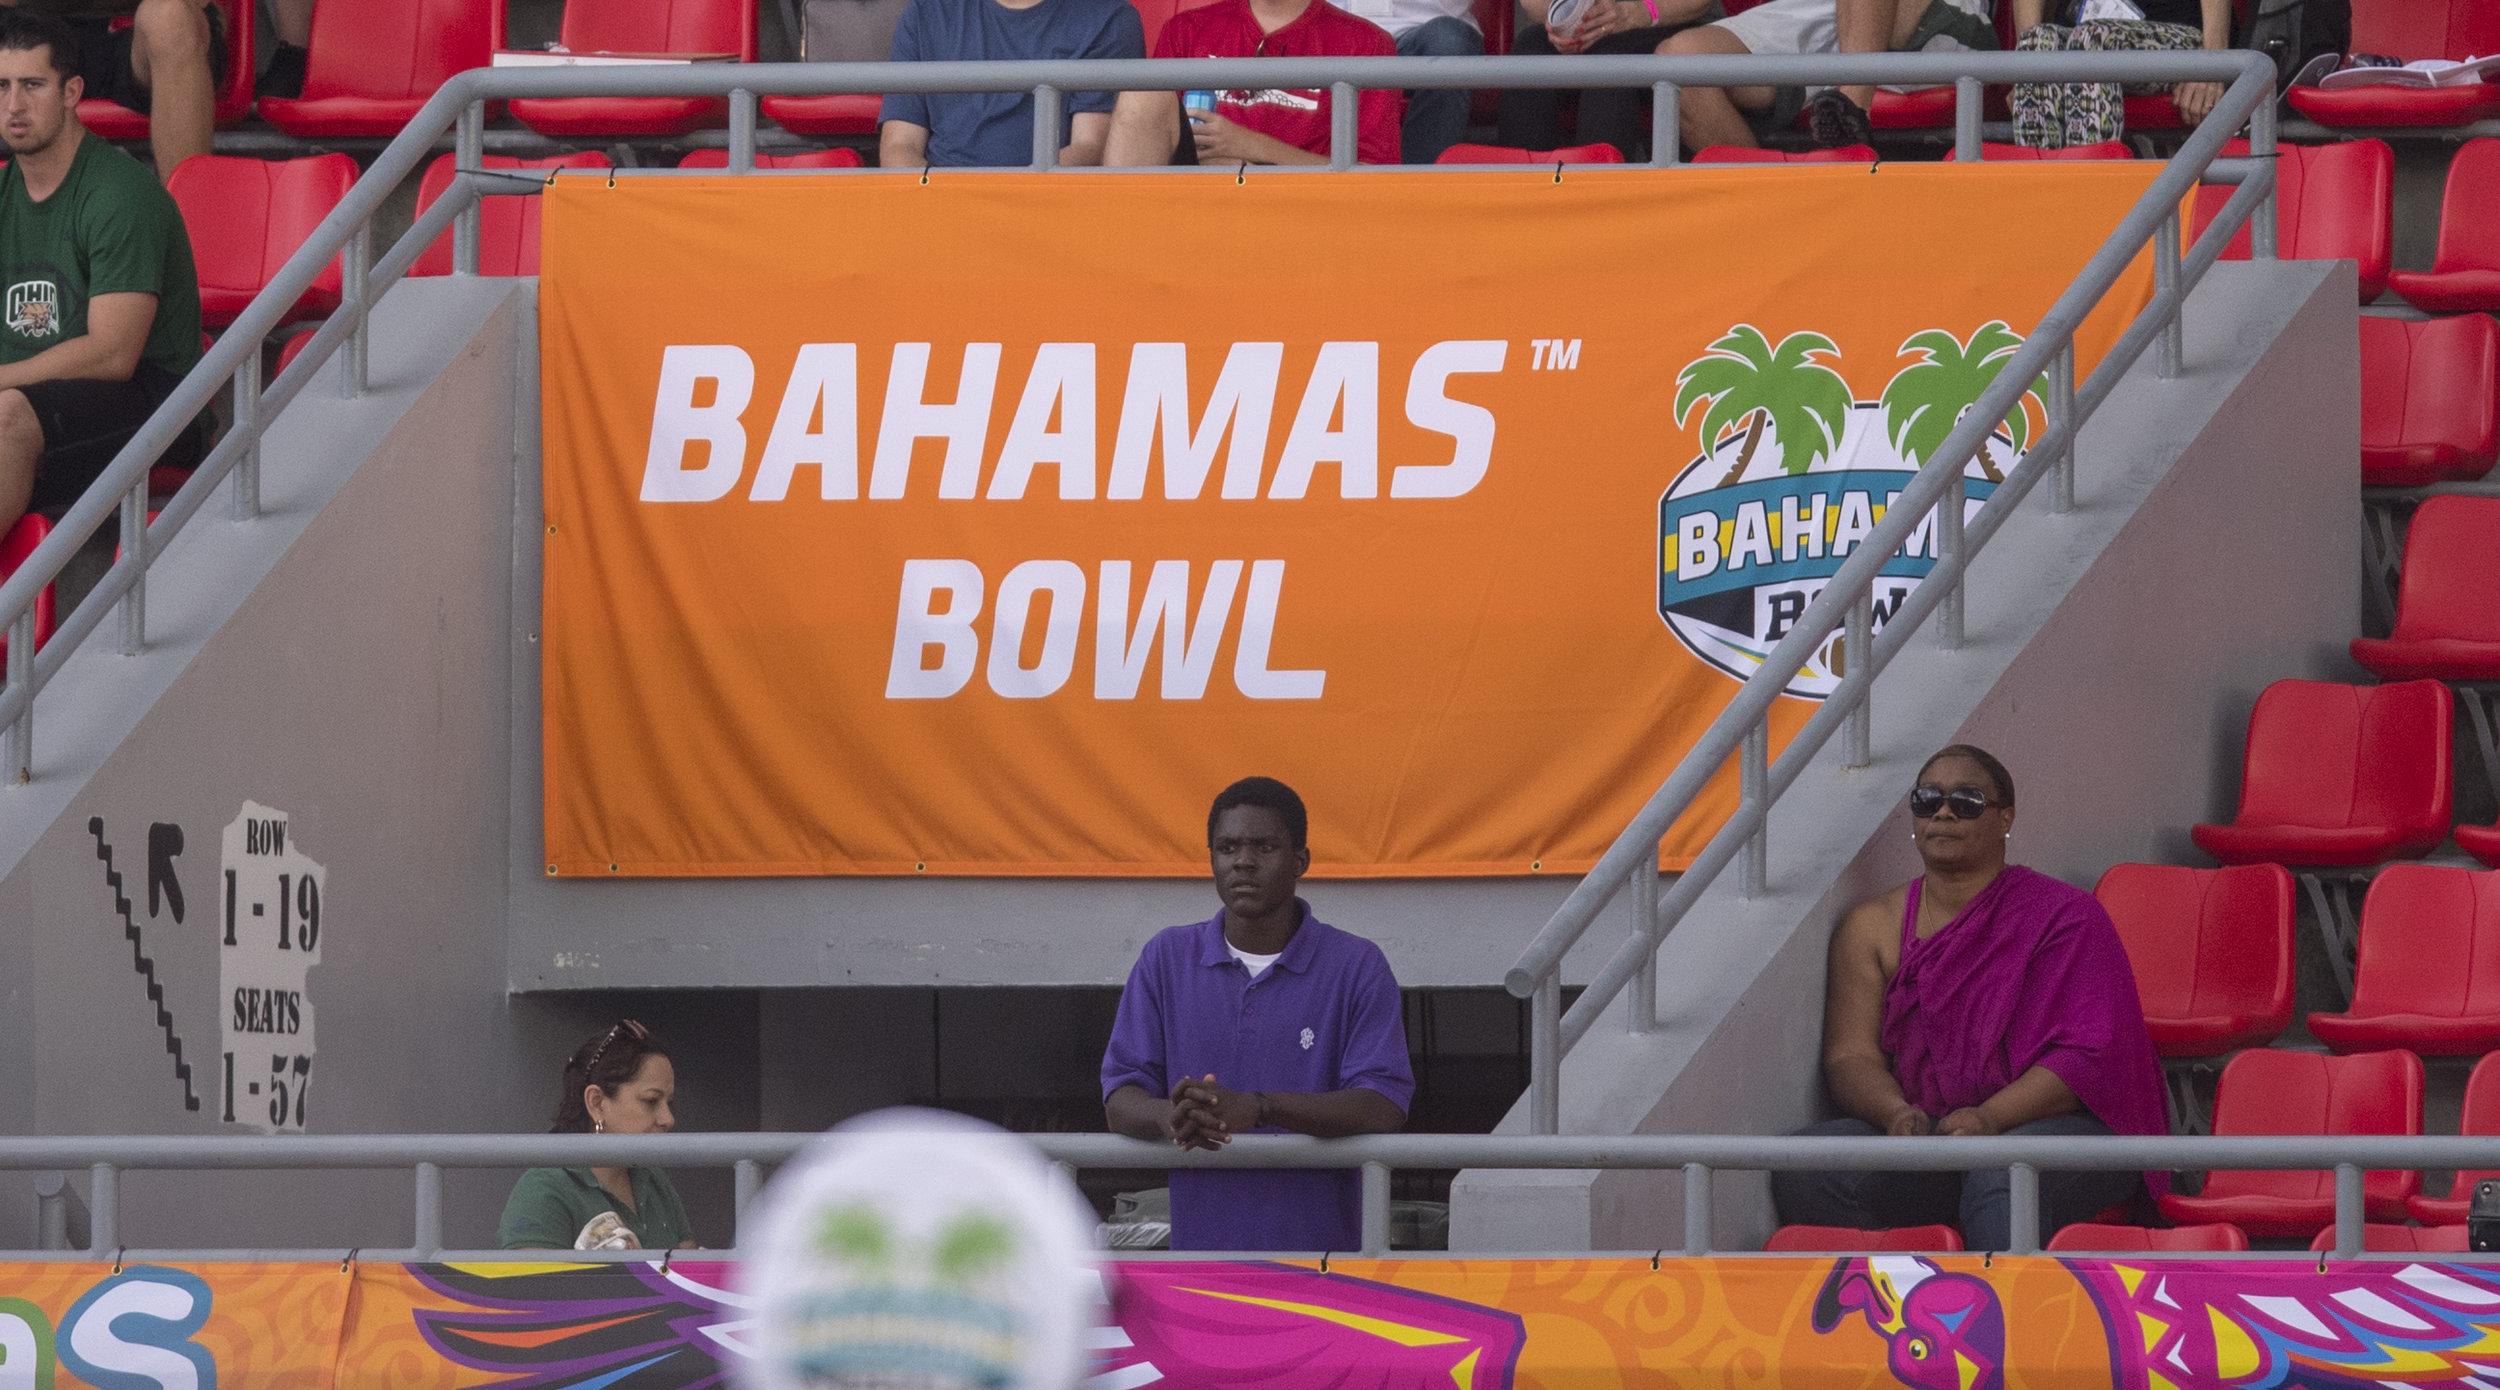 20171222_ESPN_BahamasBowl_DAY_5_258.JPG